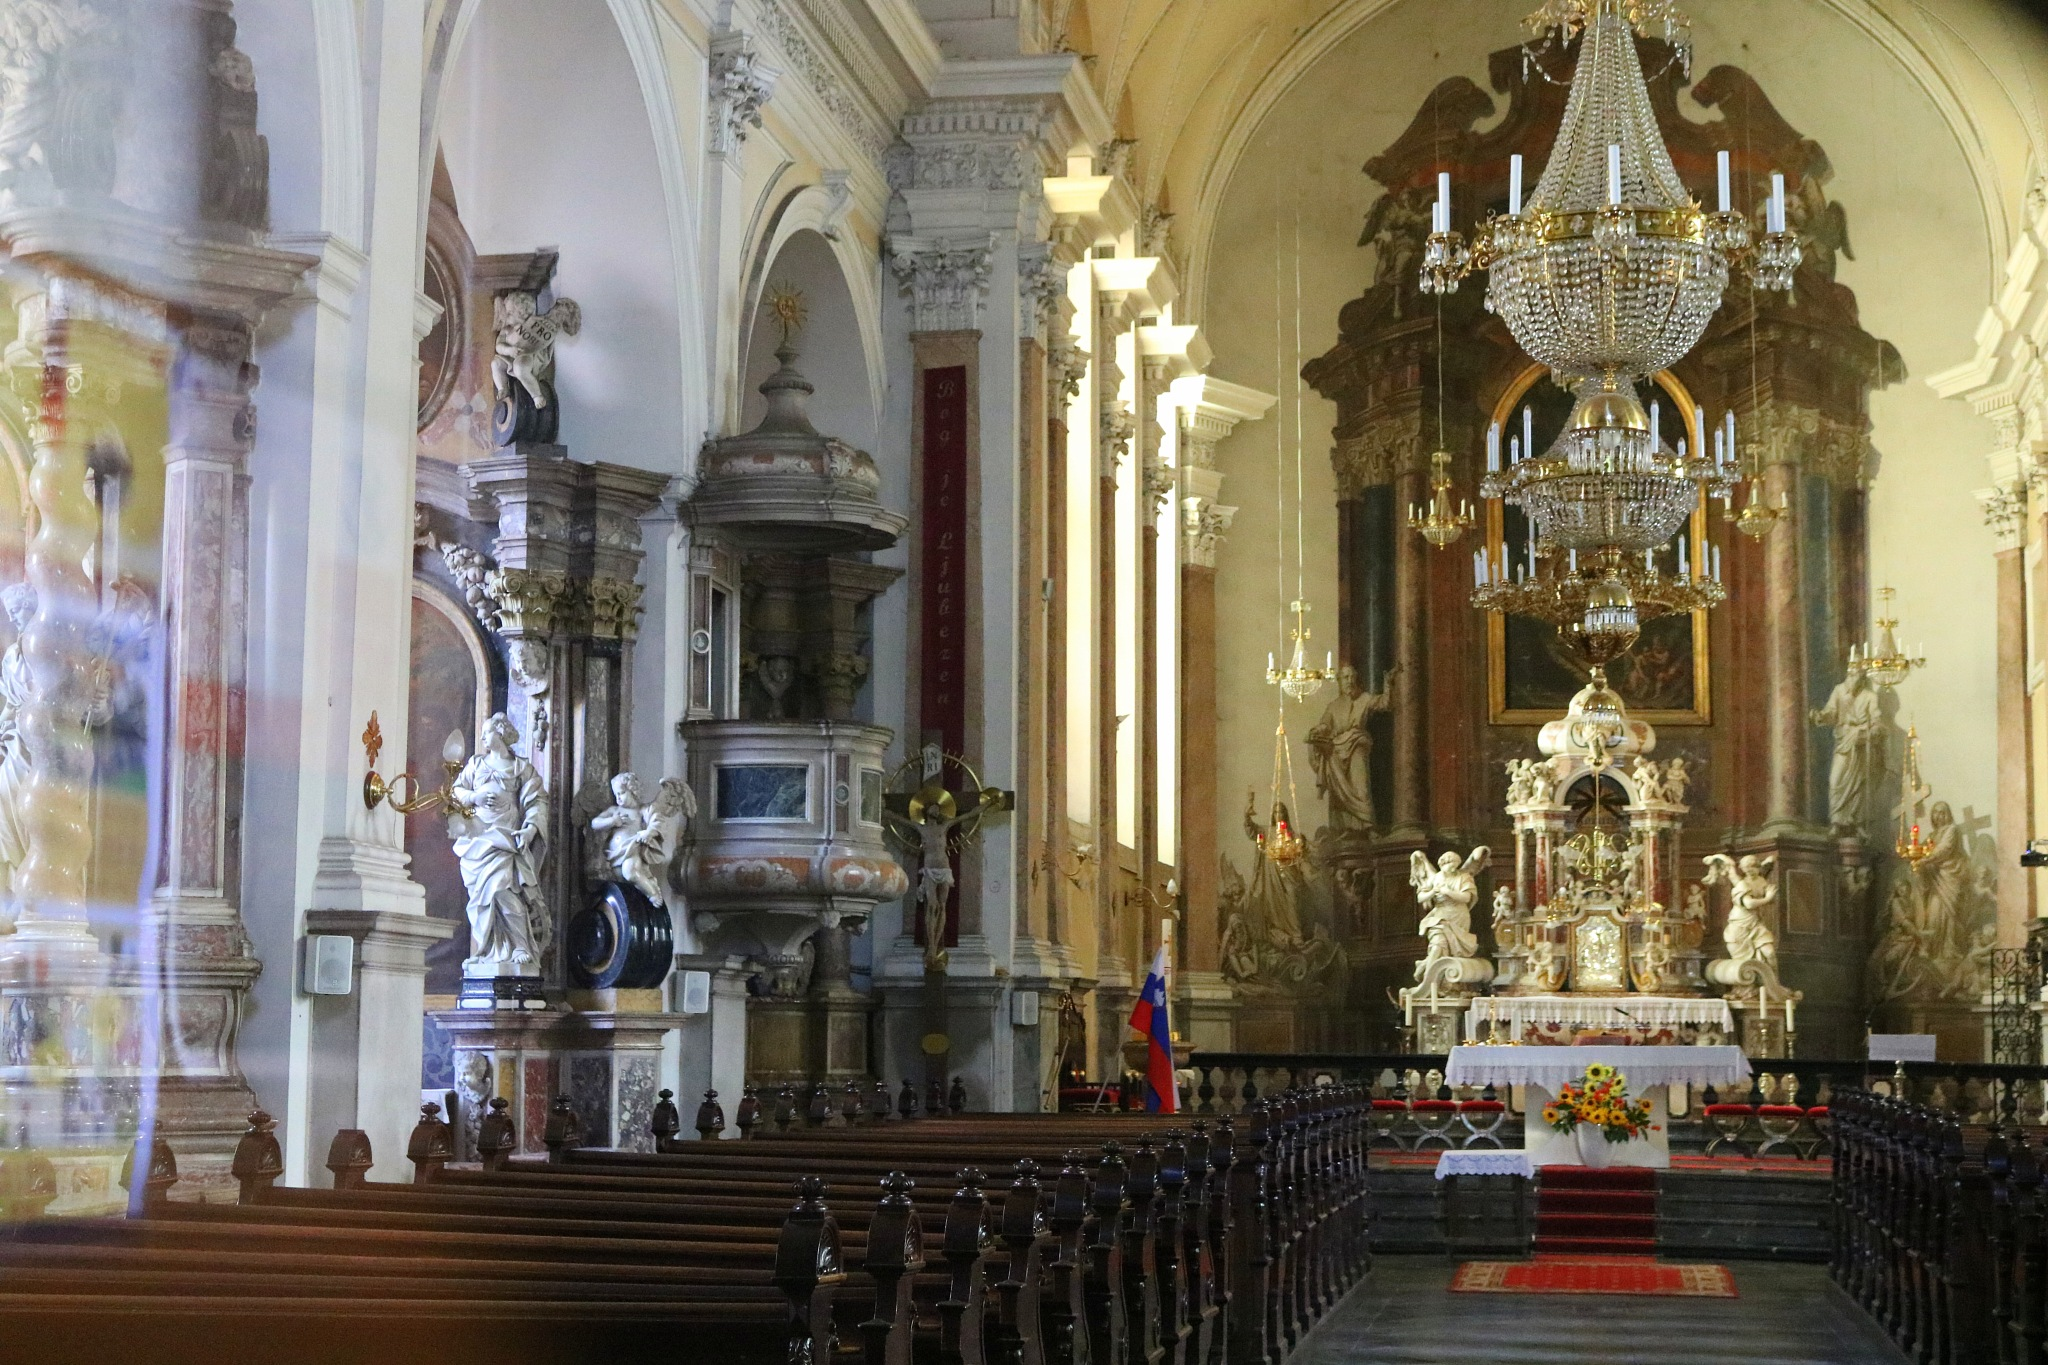 St. James' Church, Ljubljana, Slovenia by zvnktomasevic